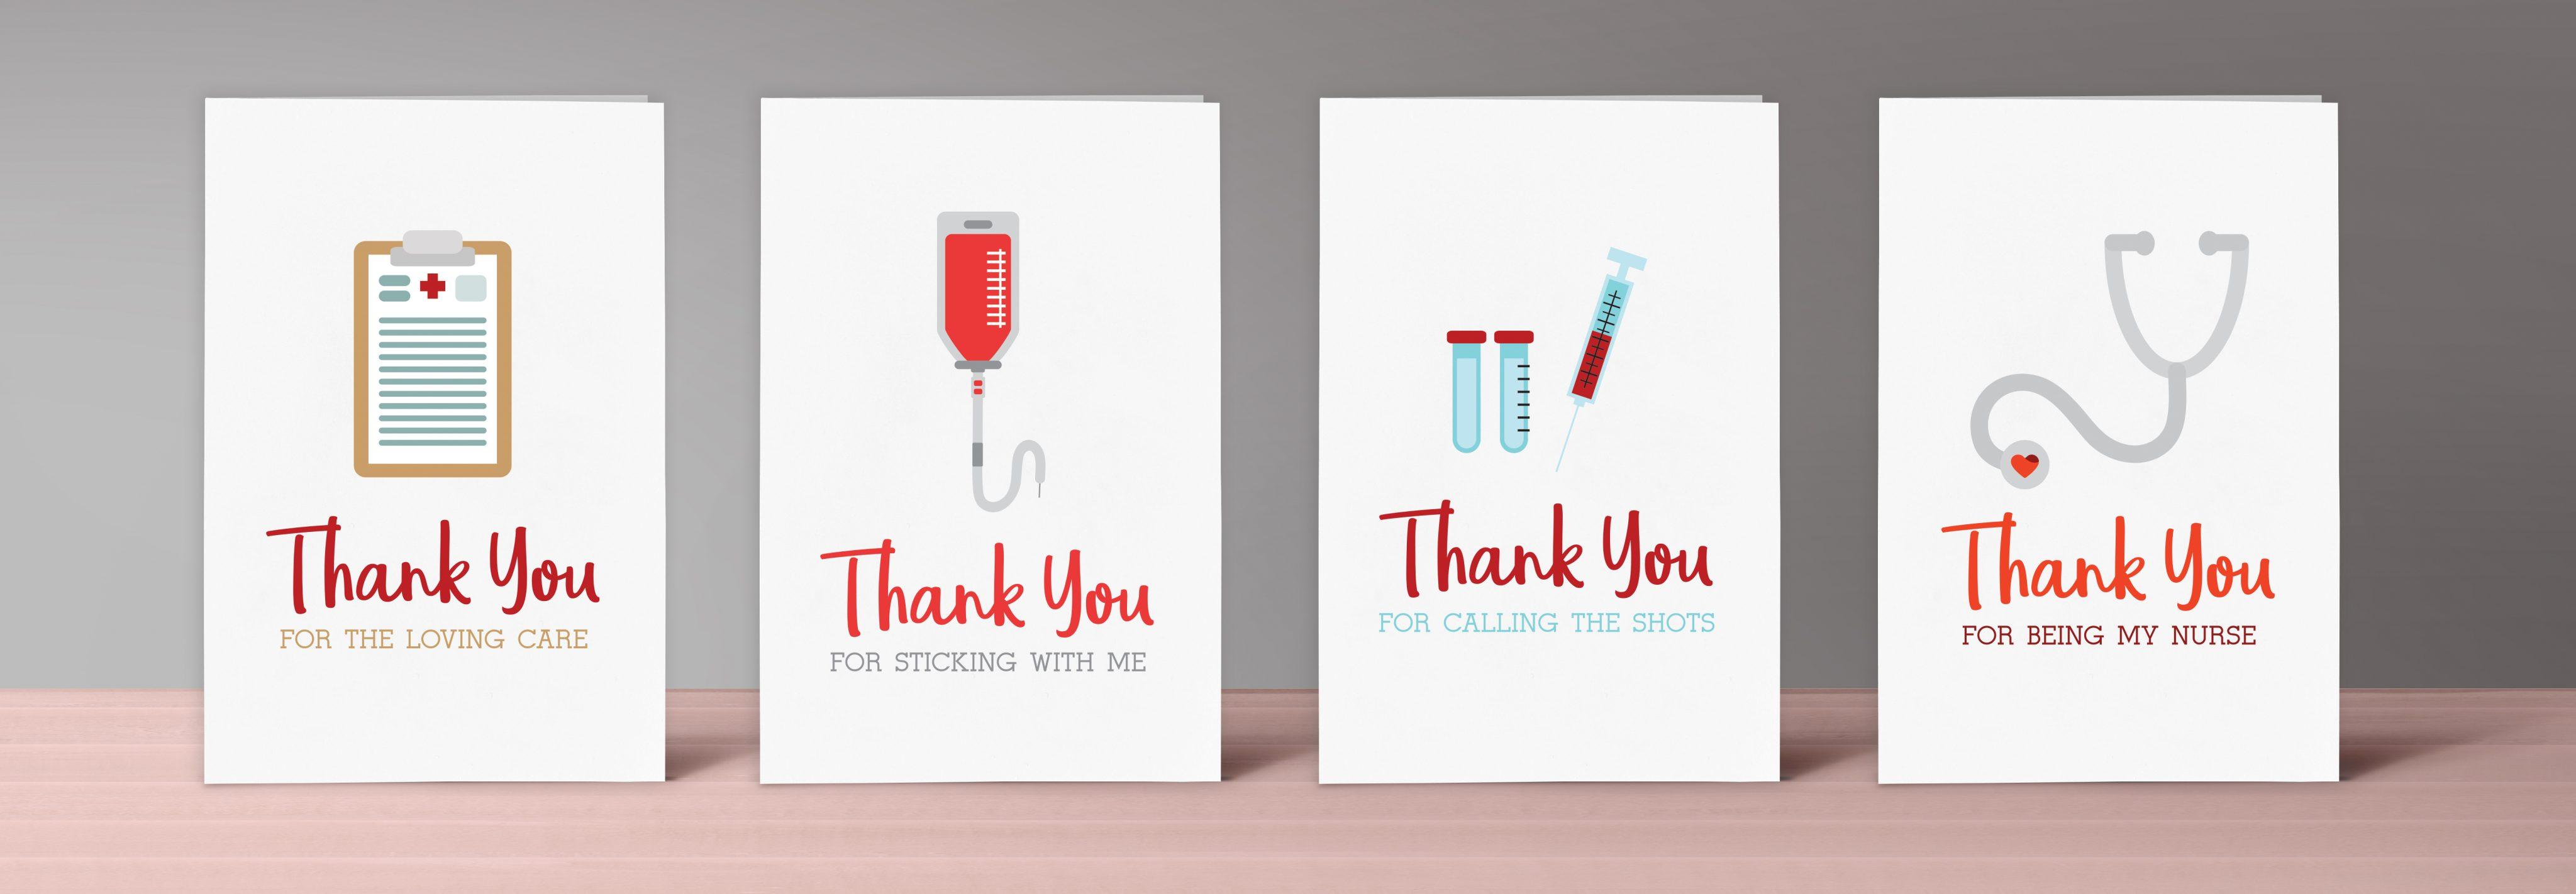 Printable Nurse Thank You Cards Set Of 4 NurseLifeGear